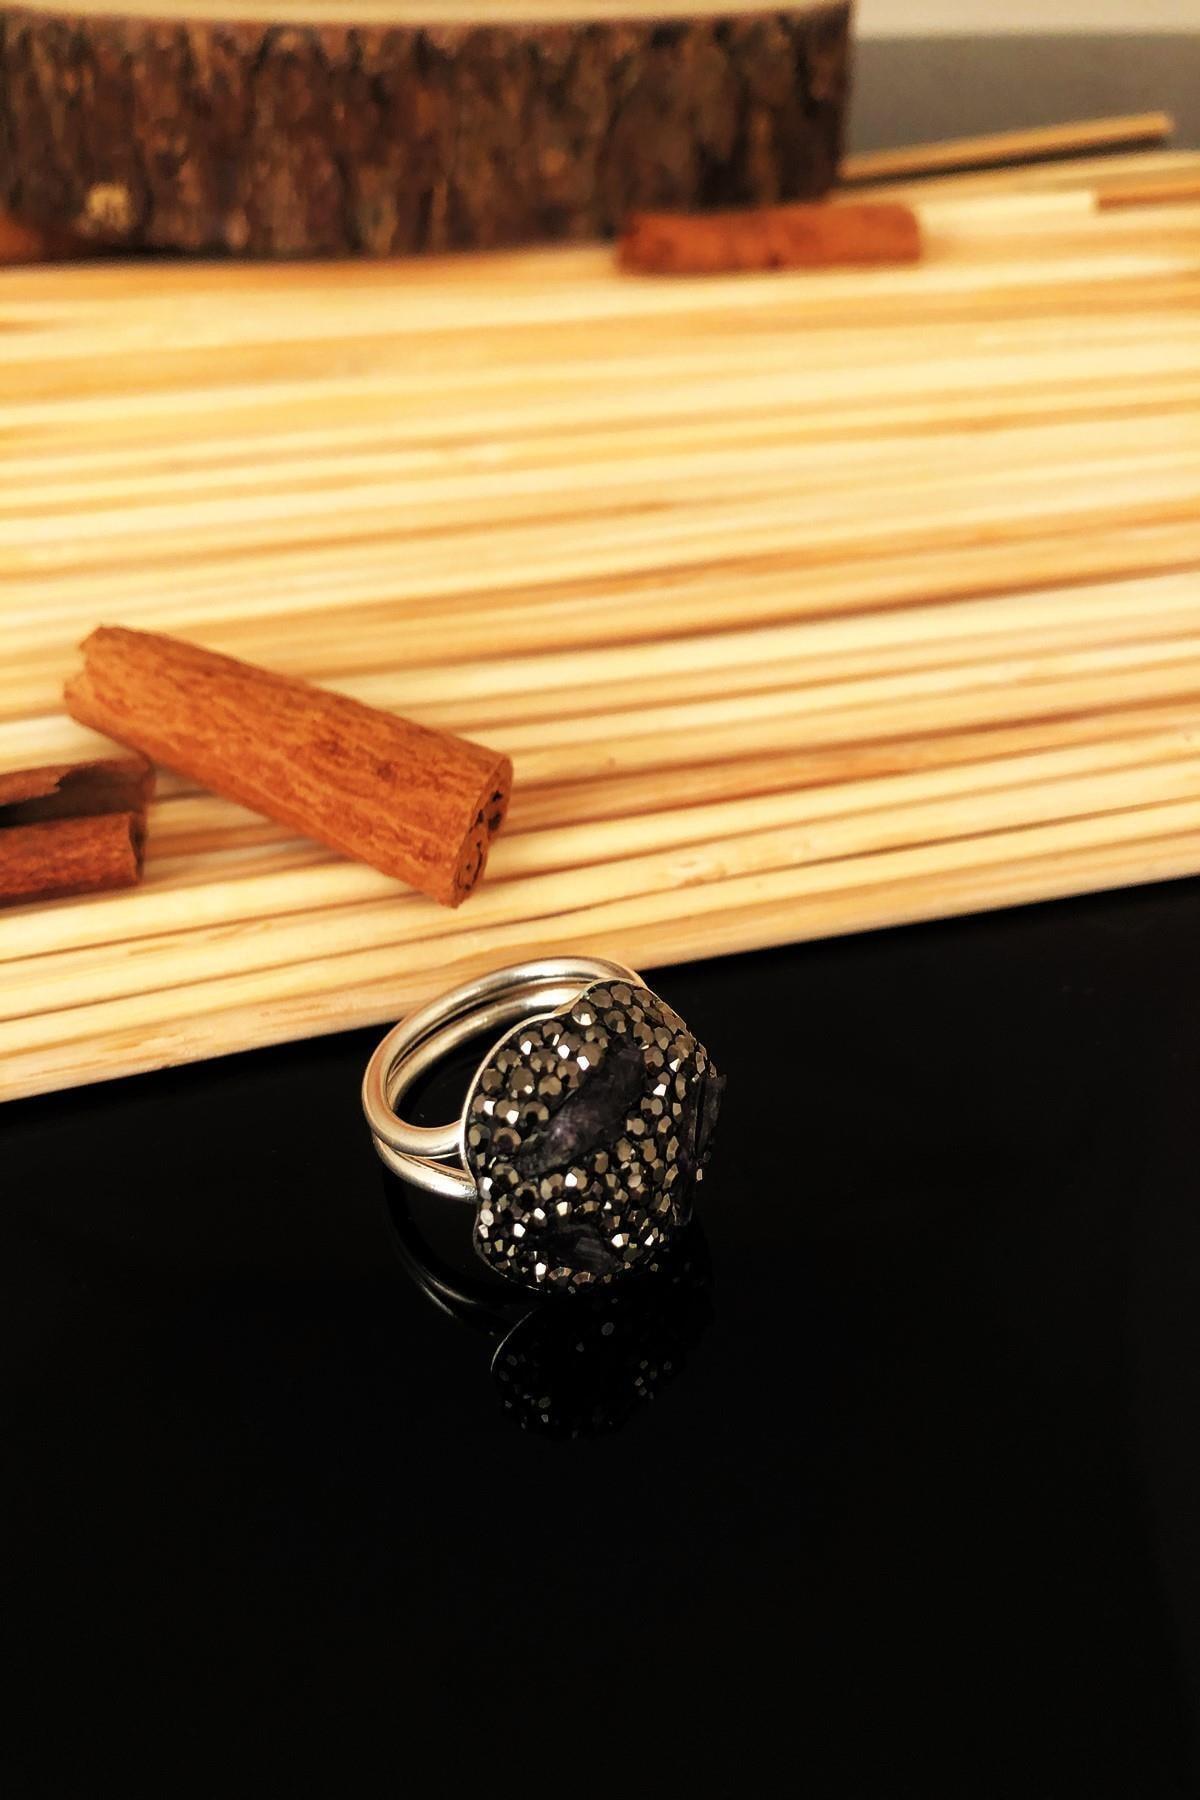 Dr. Stone Dr Stone Doğaltaş El Yapımı Ametist Taşı Gümüş Kaplama Anatolia Ayarlanabilir Halkalı Yüzük Ktdr70 1